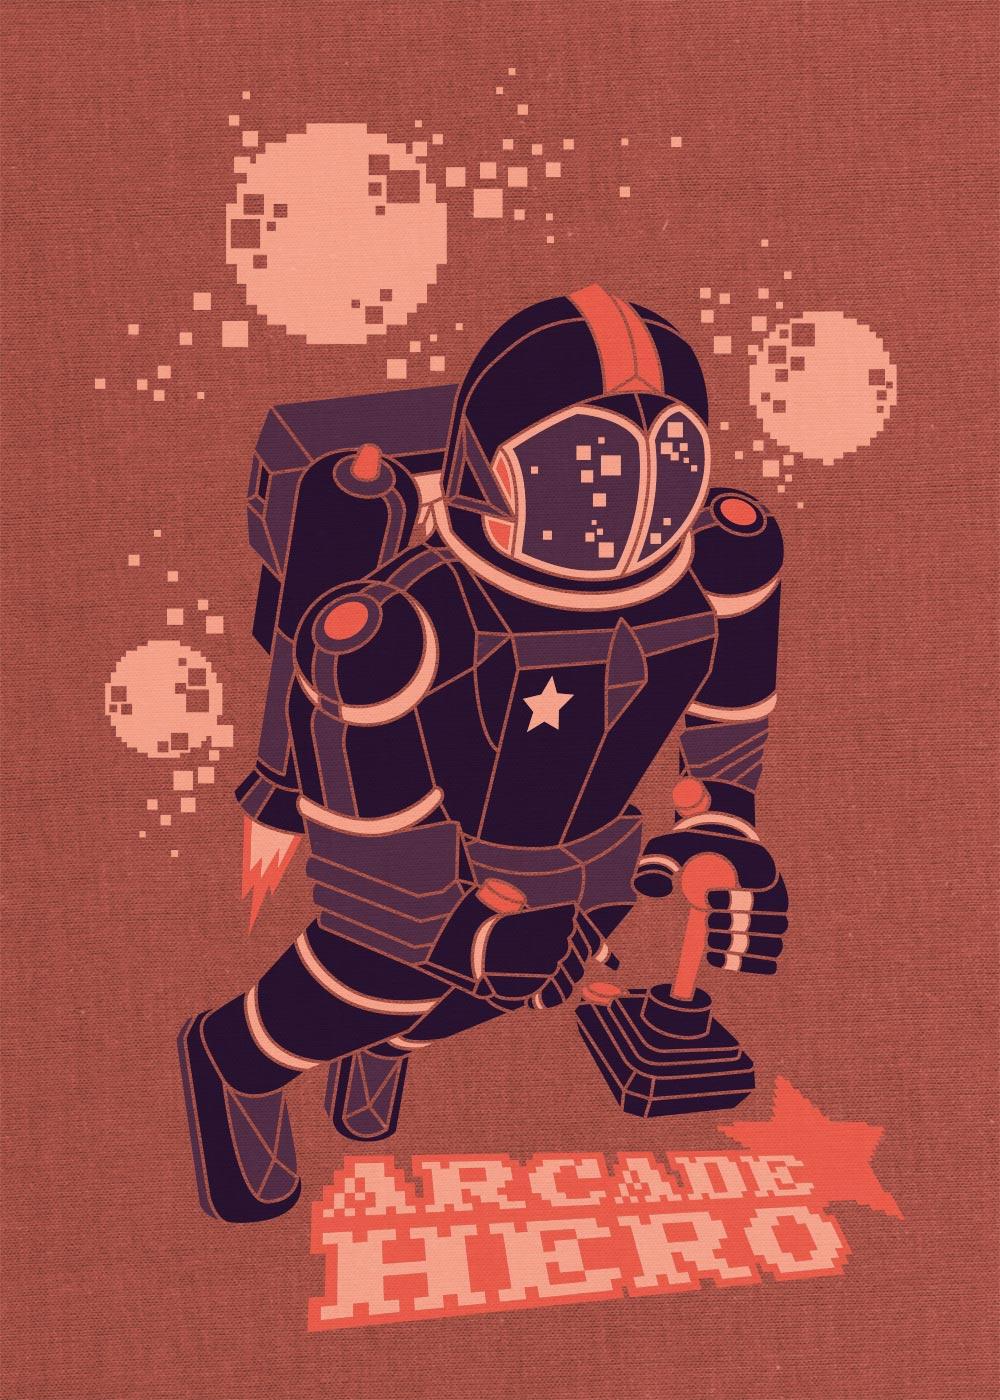 Arcade Hero Illustration Design - Björn Siems